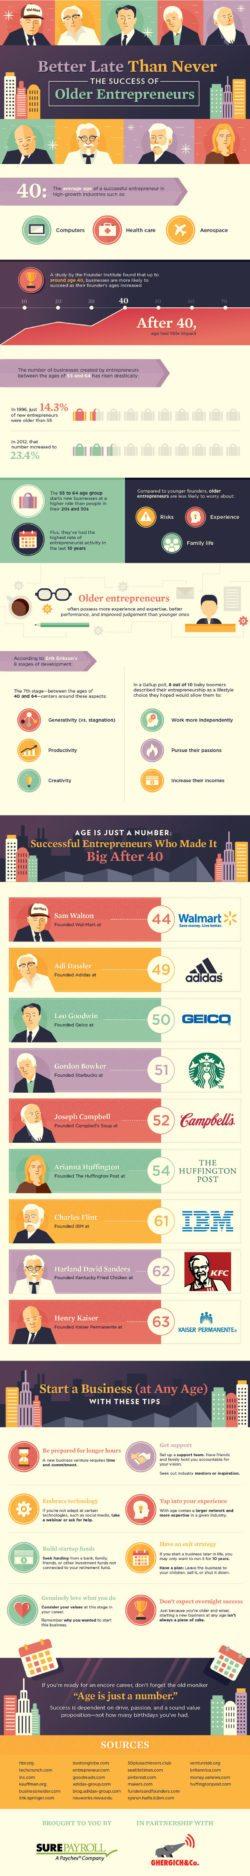 success-of-older-entrepreneurs-infographic